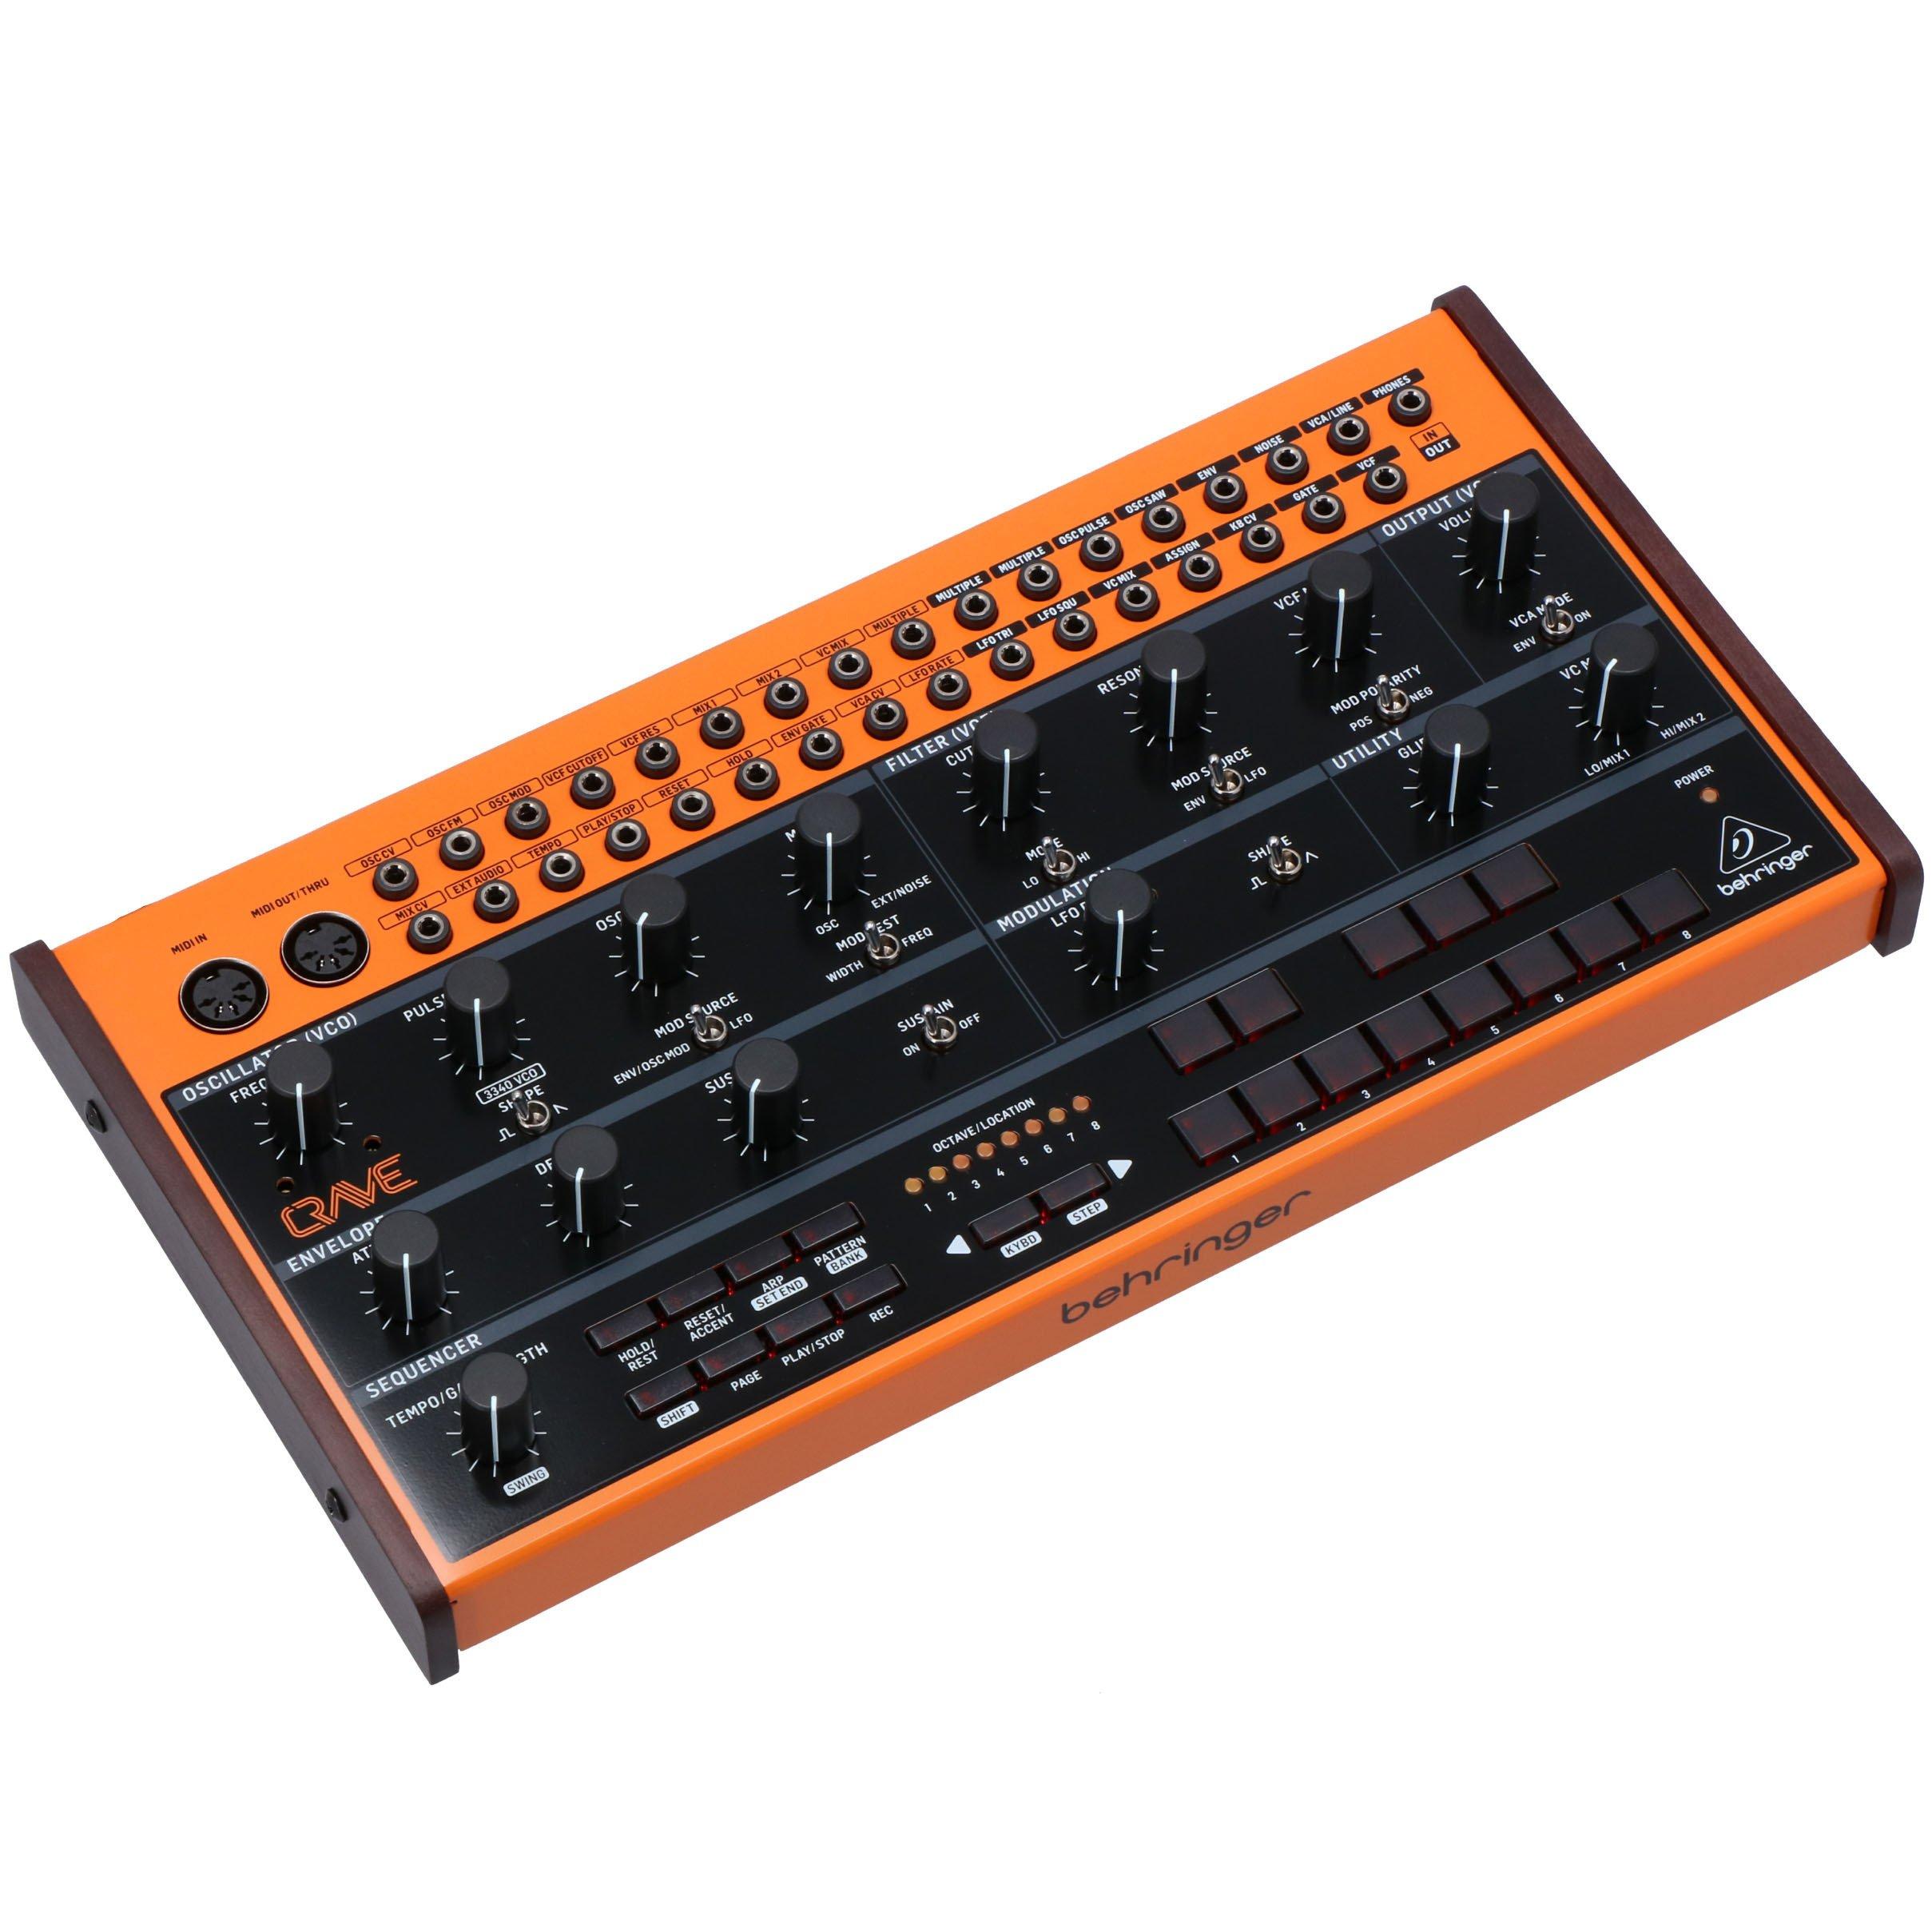 Behringer Crave semi-modular synthesizer - £122 @ Bax-shop